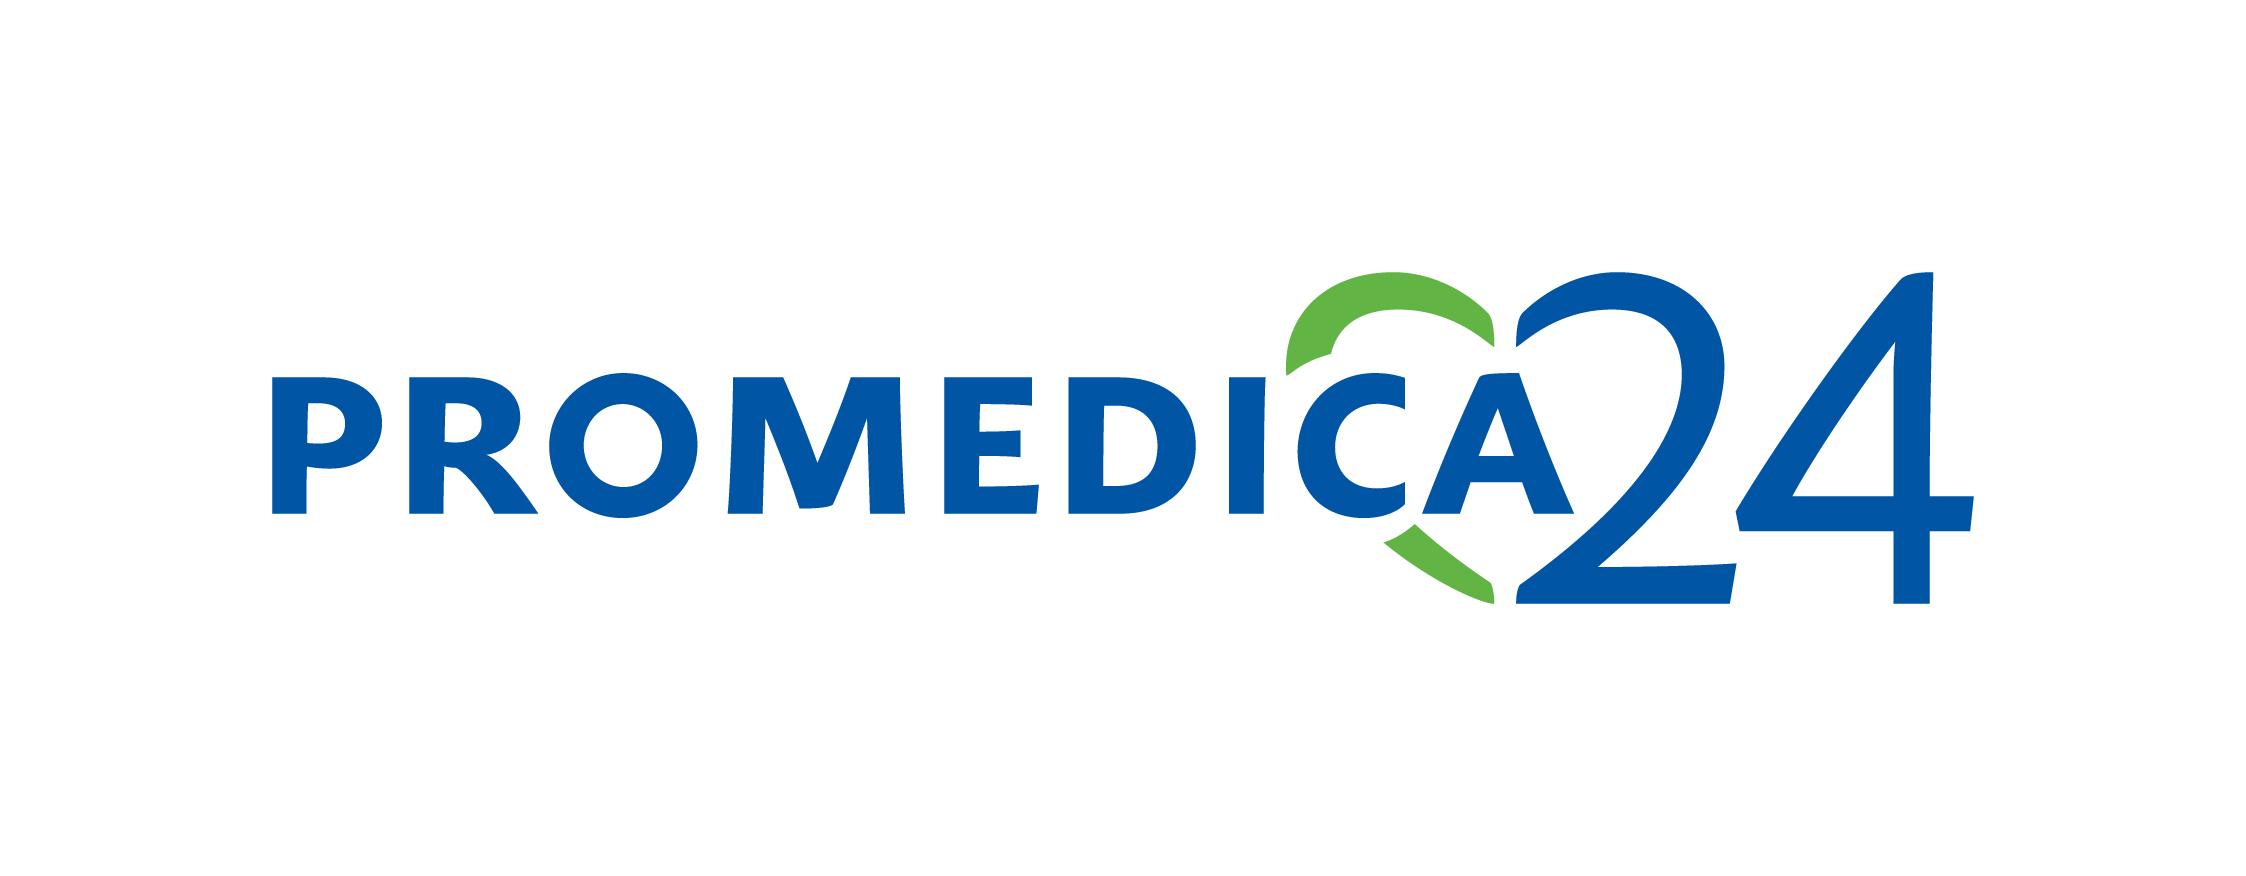 Promedica24